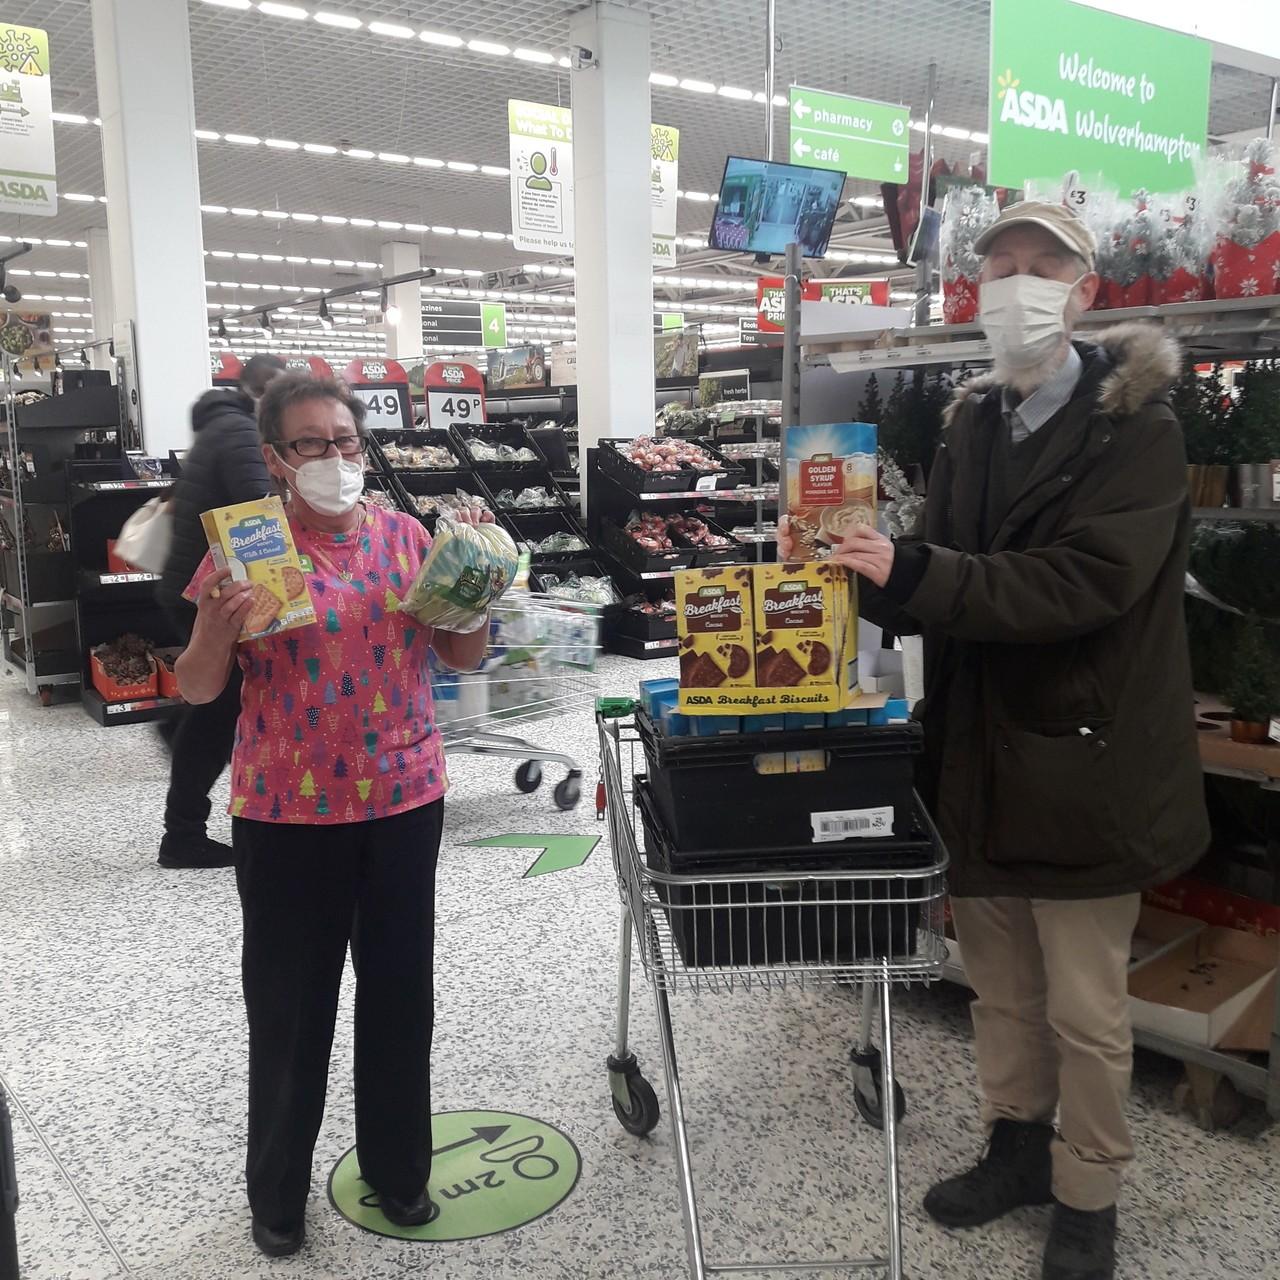 Breakfast pack donation | Asda Wolverhampton